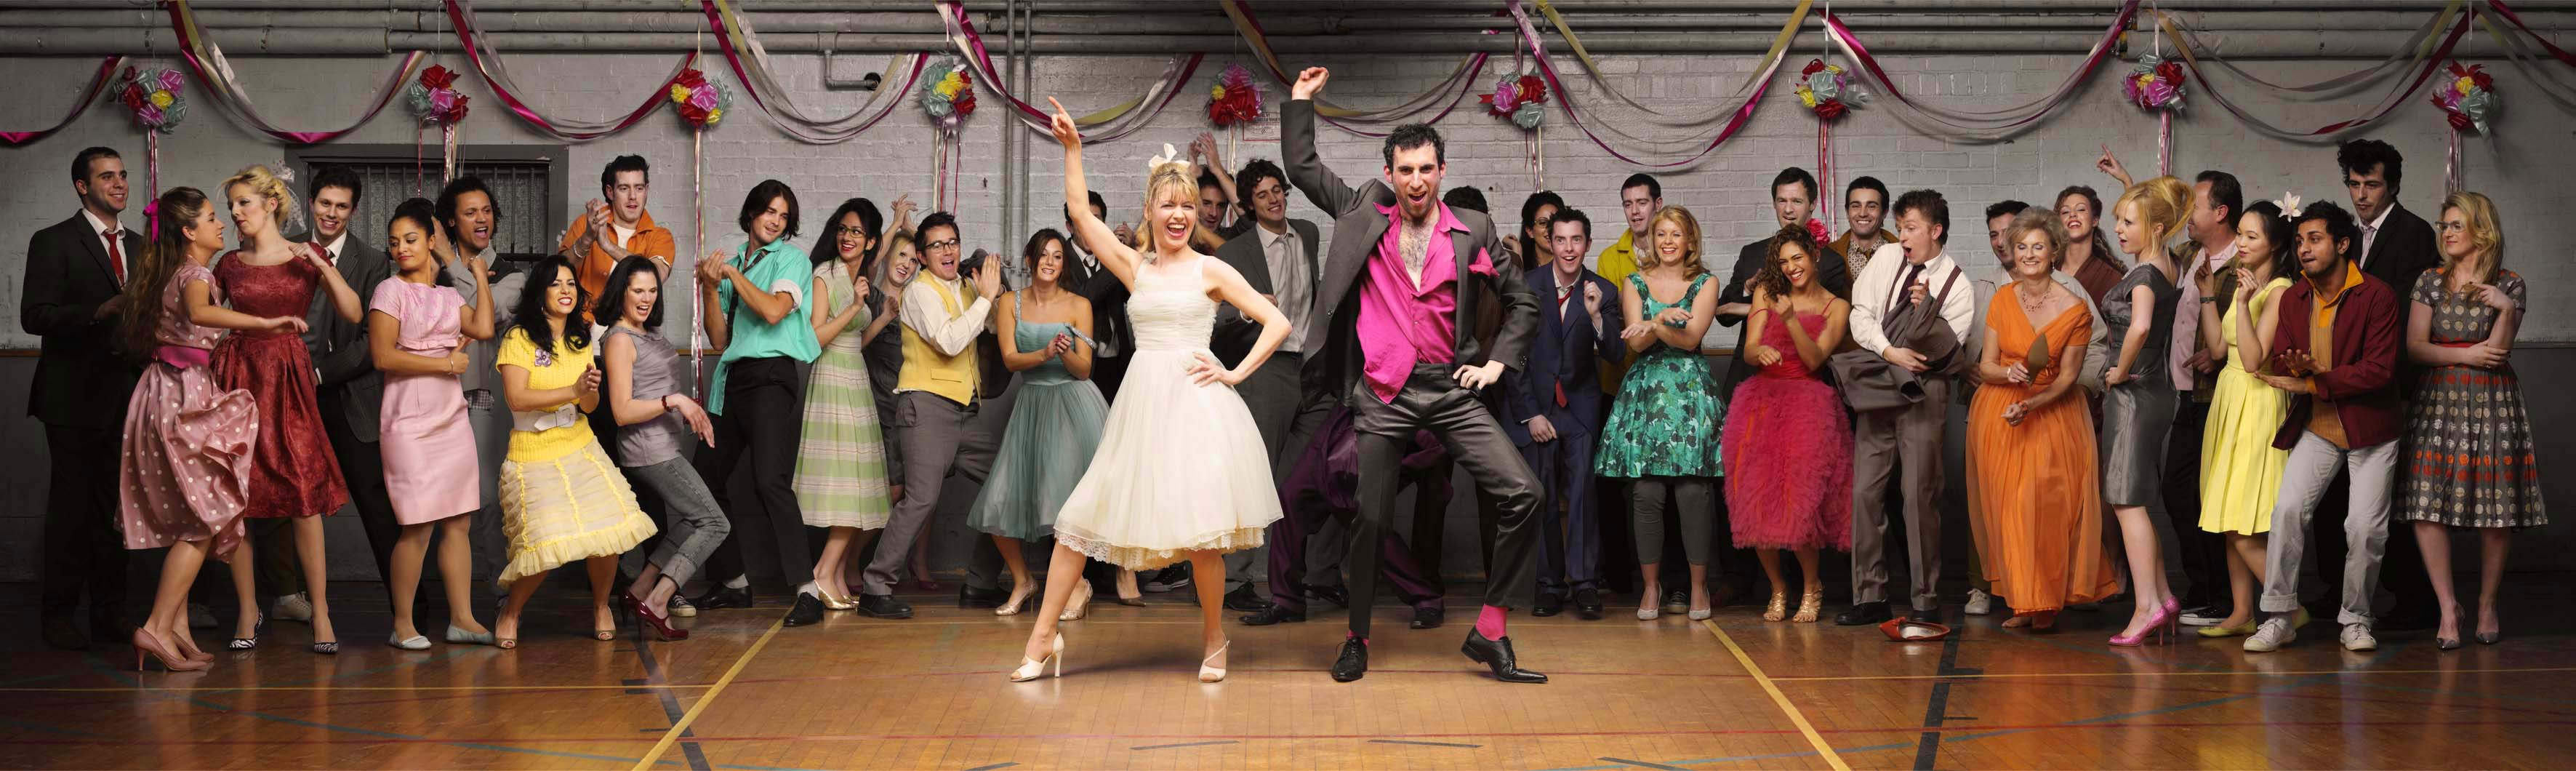 Klat_David-Stewart_Grease-Party